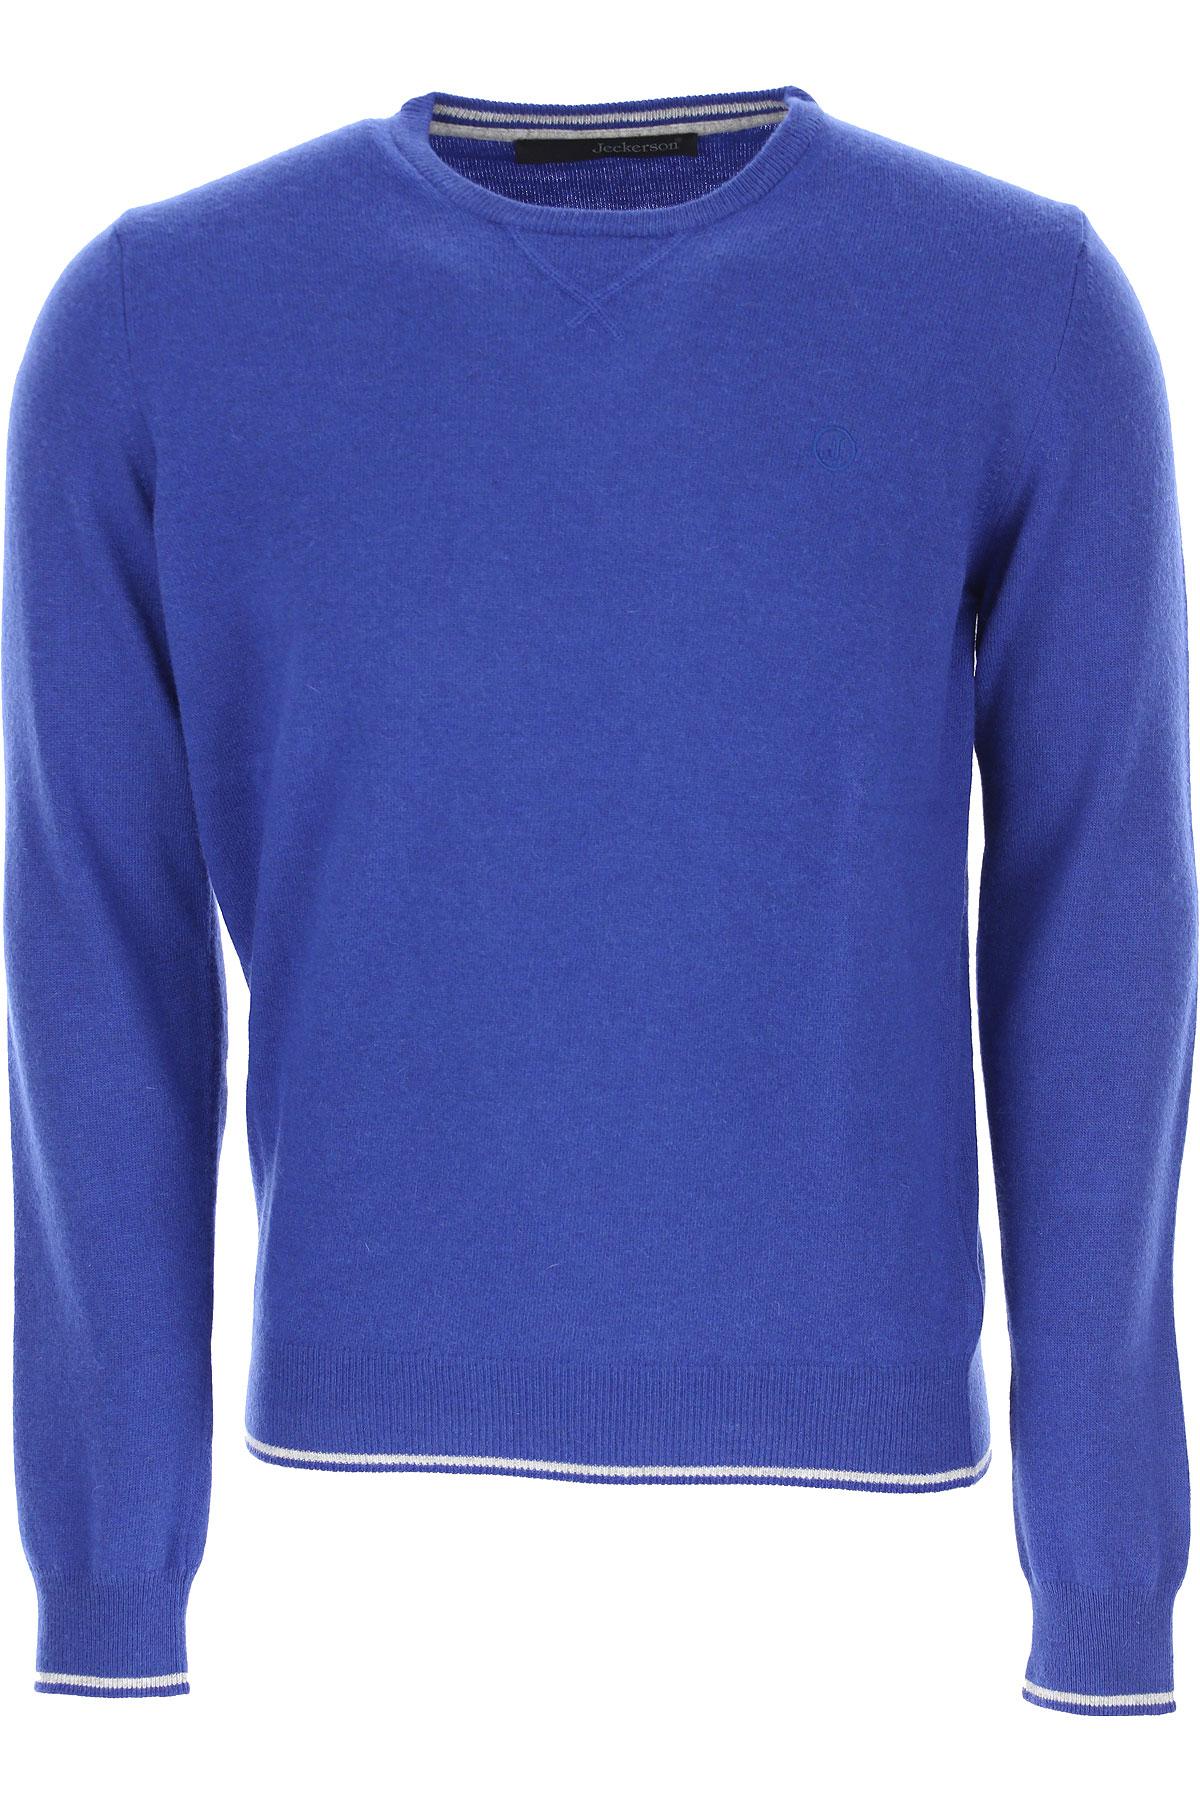 Jeckerson Sweater for Men Jumper On Sale, Bluette, polyamide, 2019, L XL